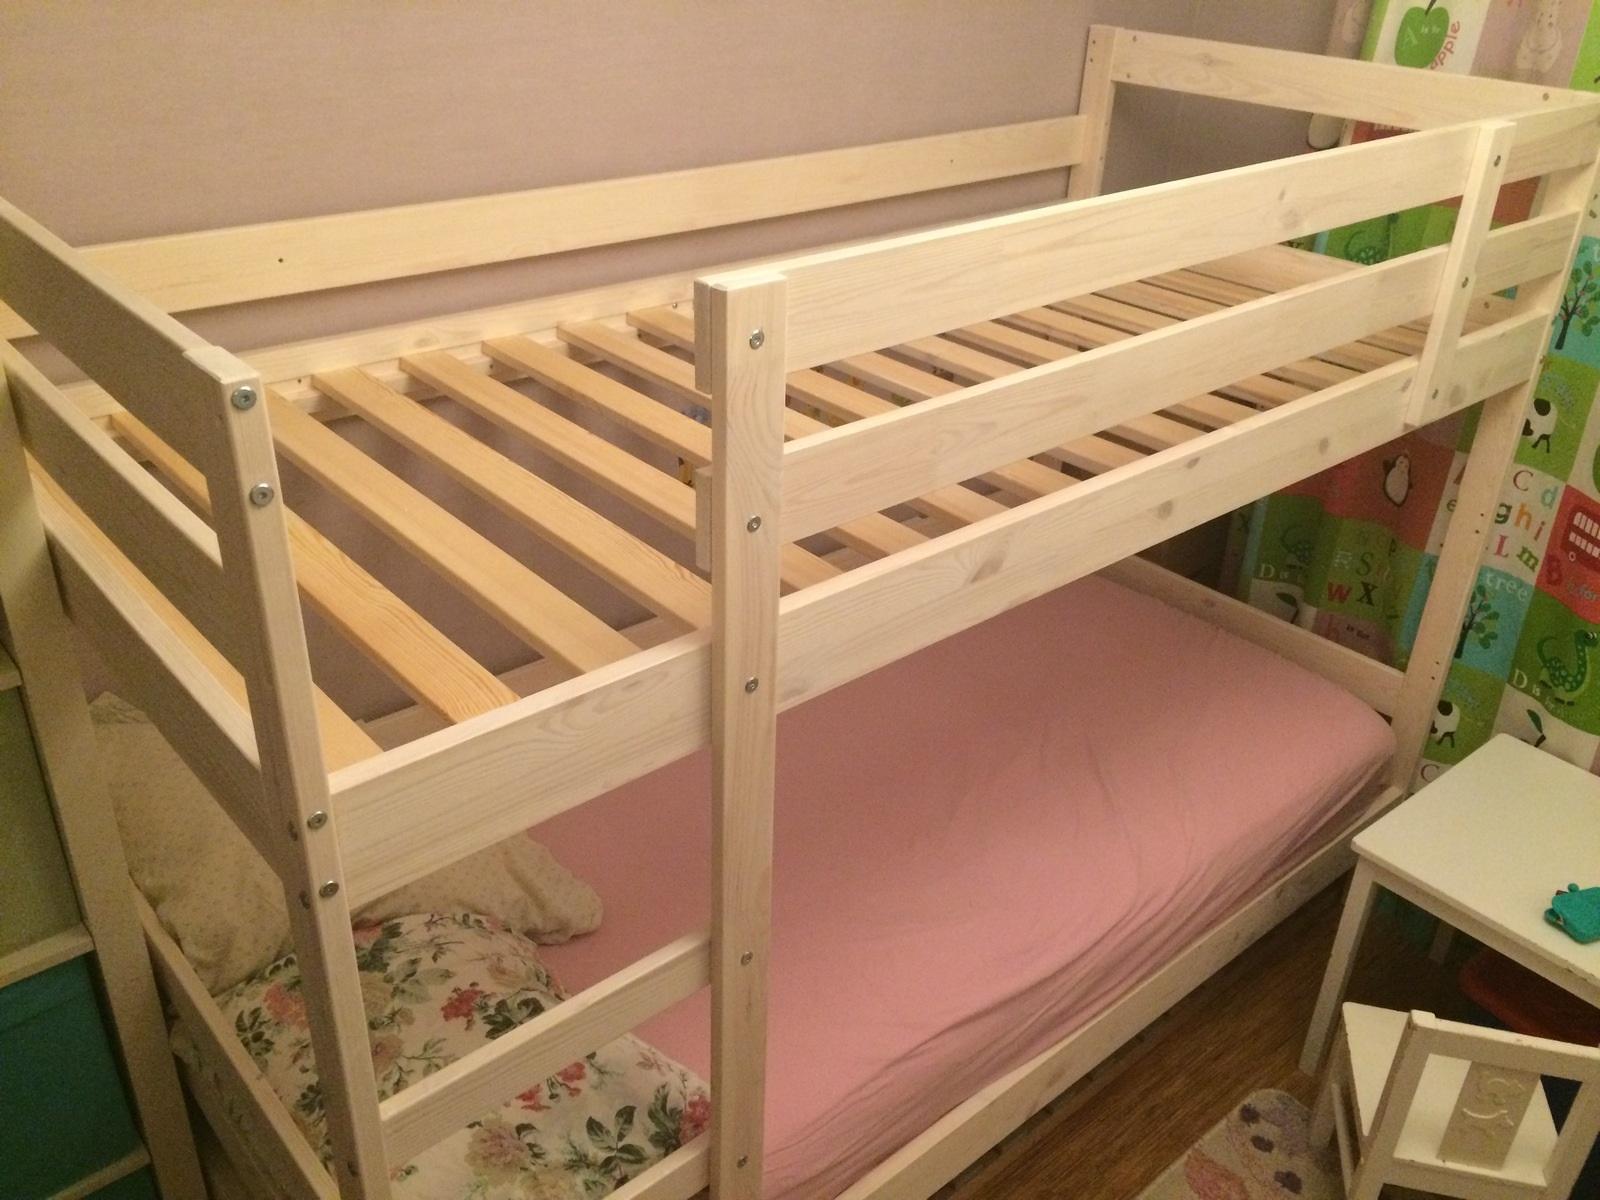 покупка матраца для кровати икеа